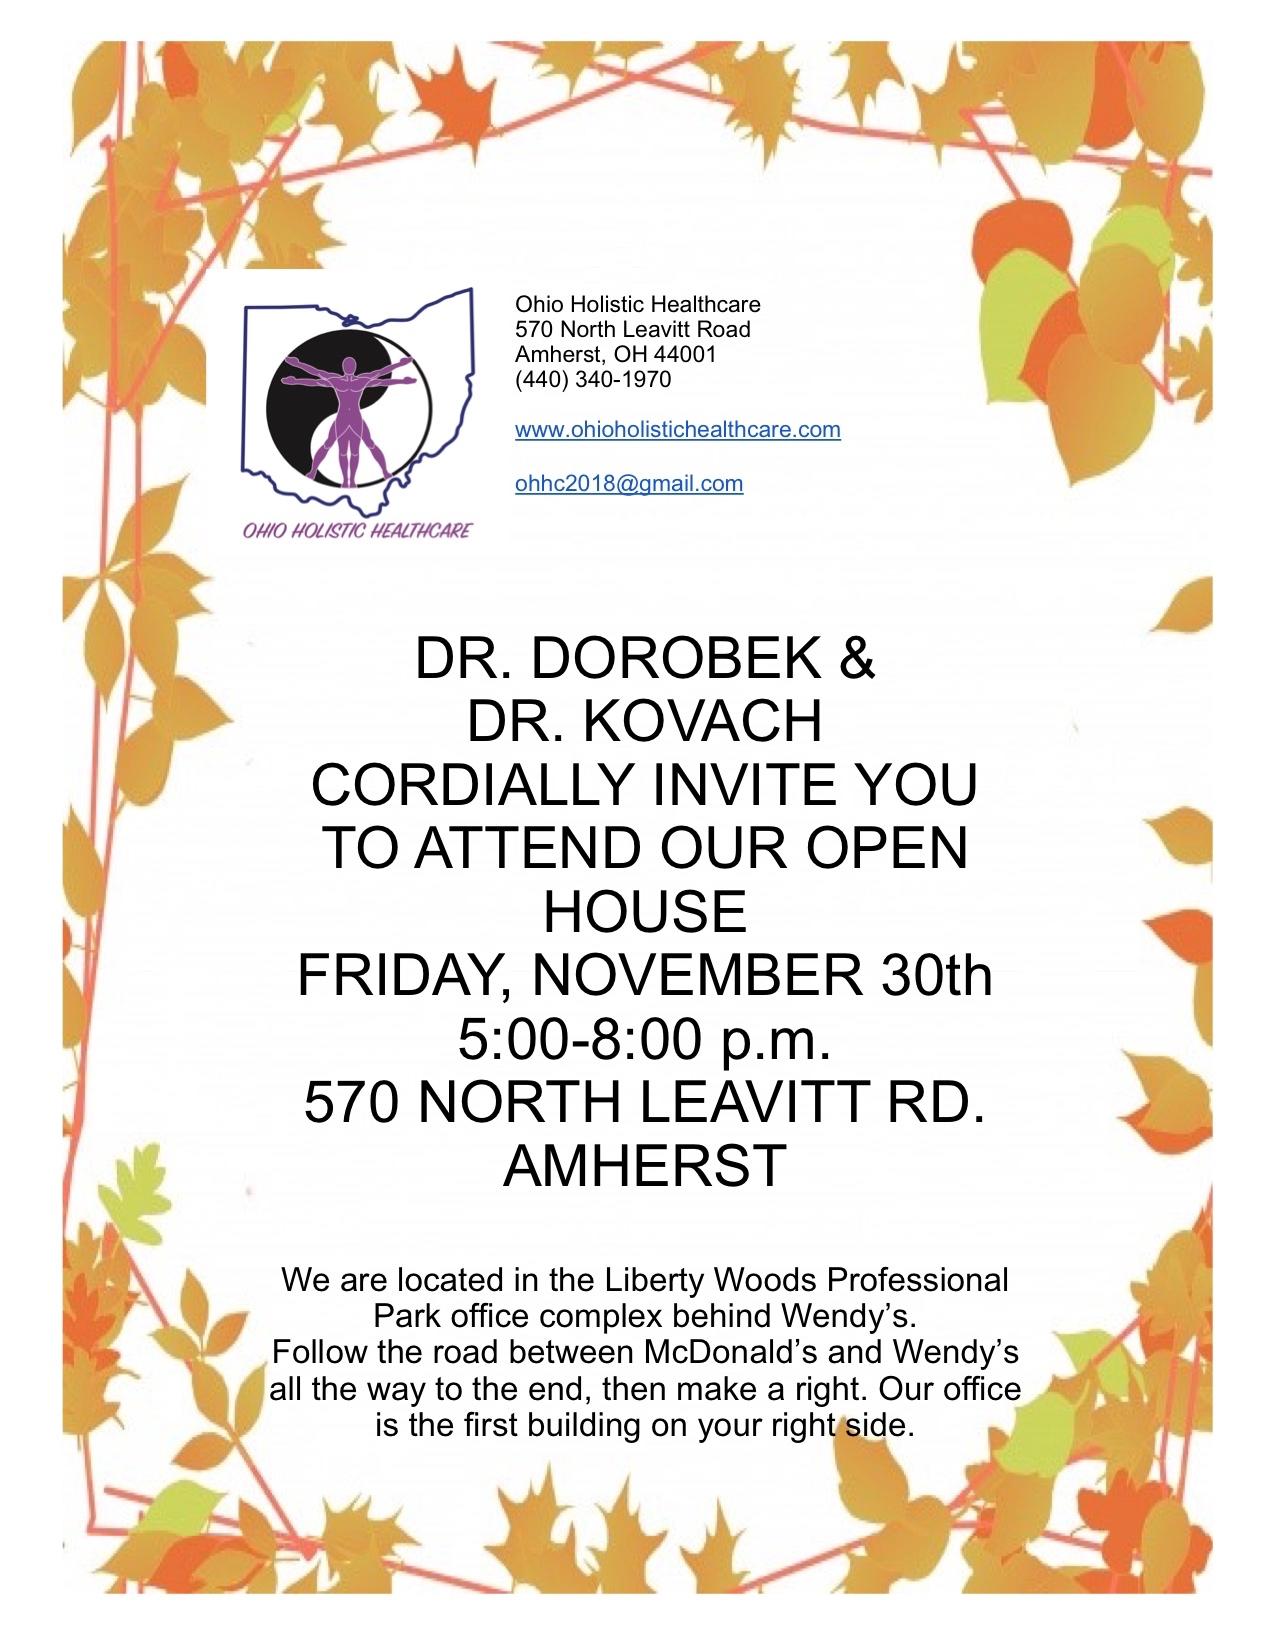 Open House Event - November 30, 2018